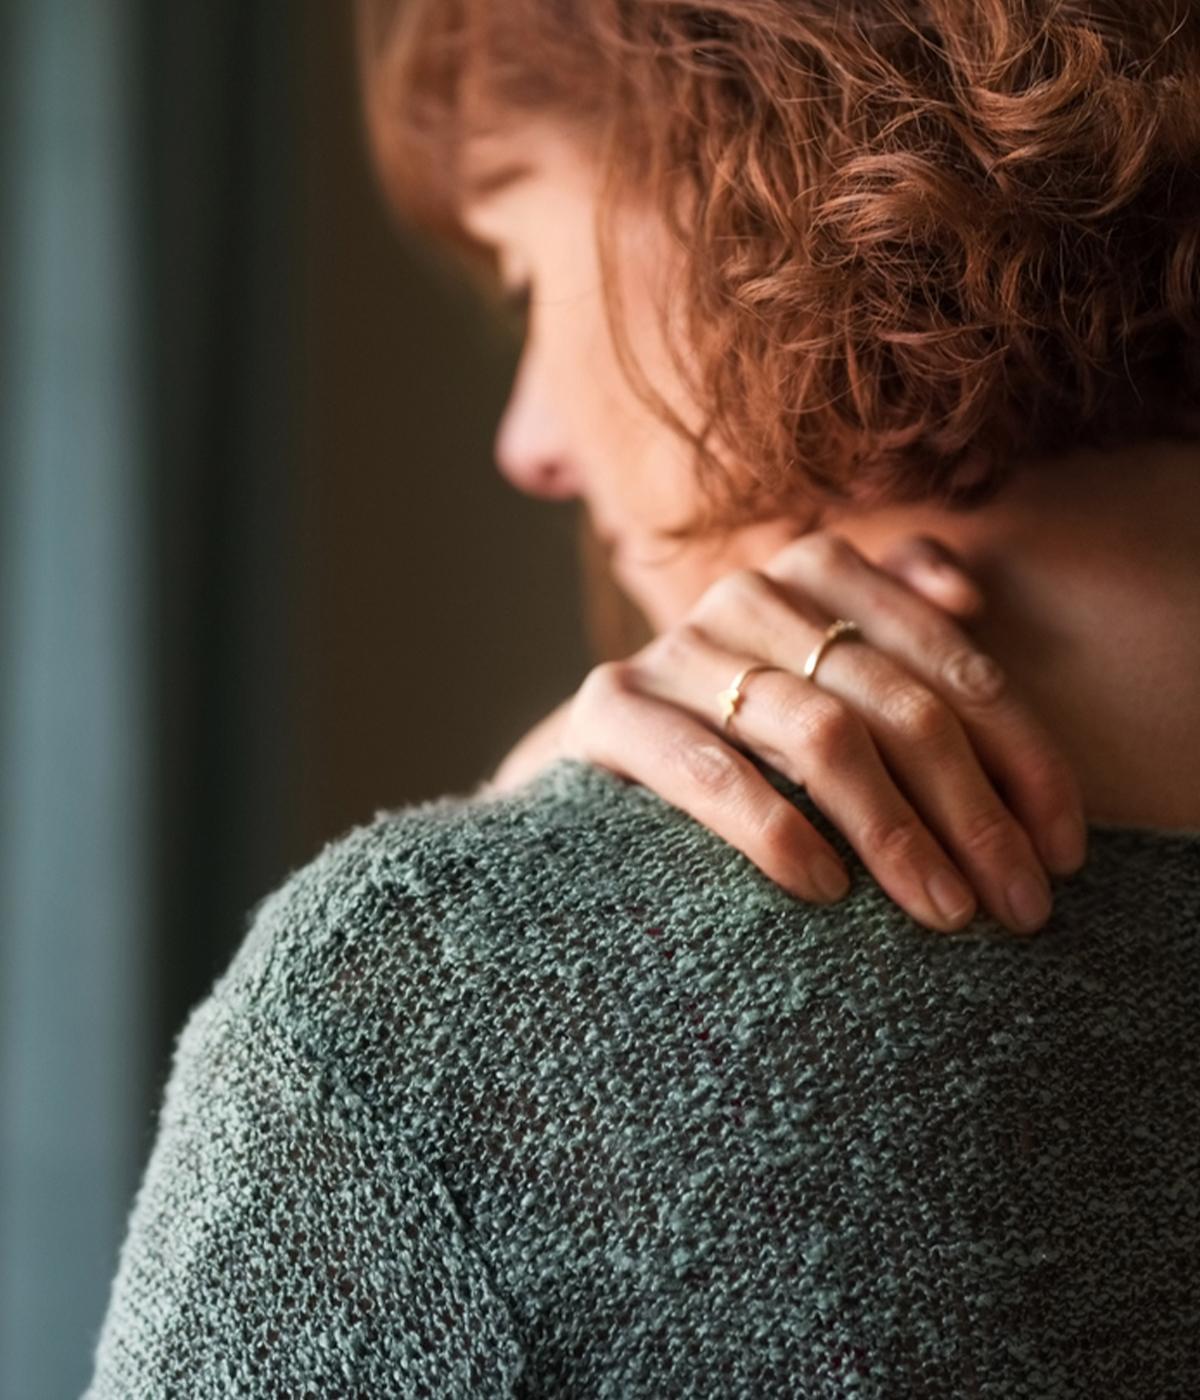 Woman grabbing shoulder because of Shoulder Pain